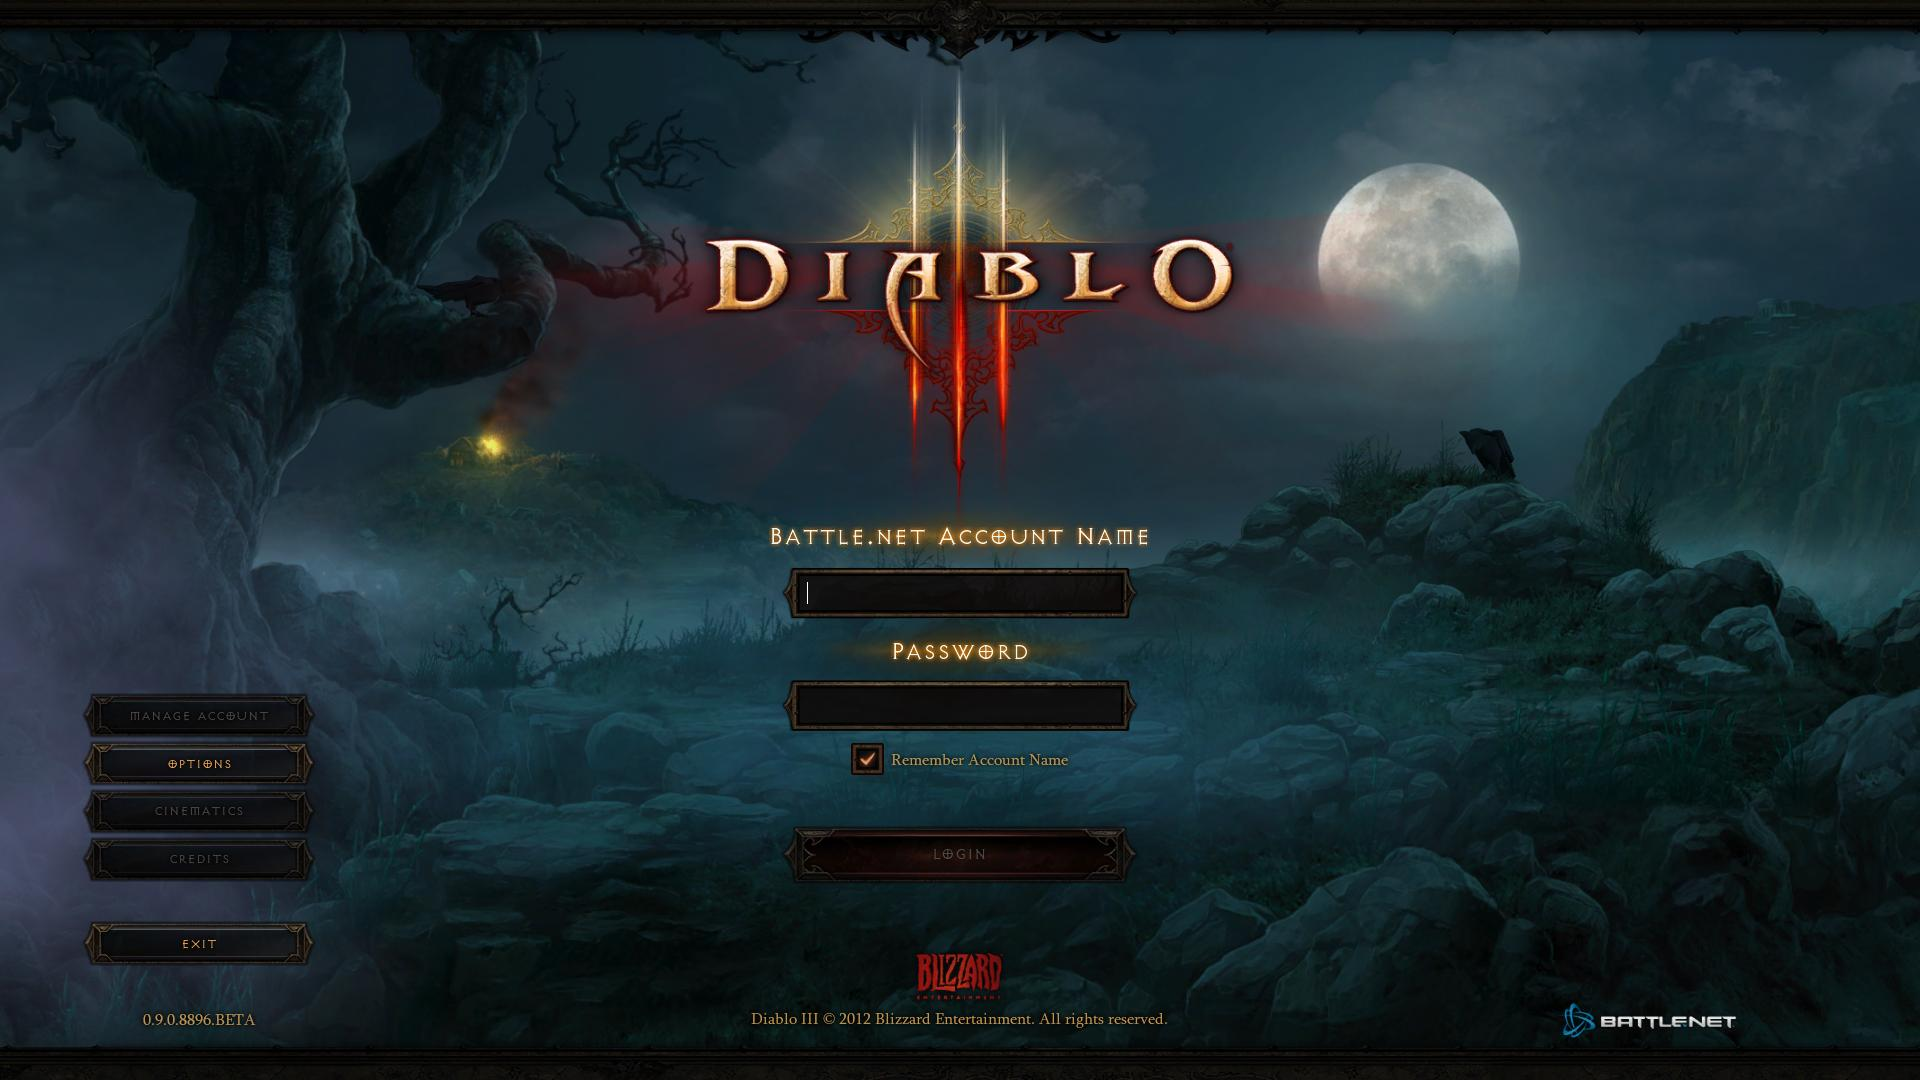 Diablo 3 startscreen